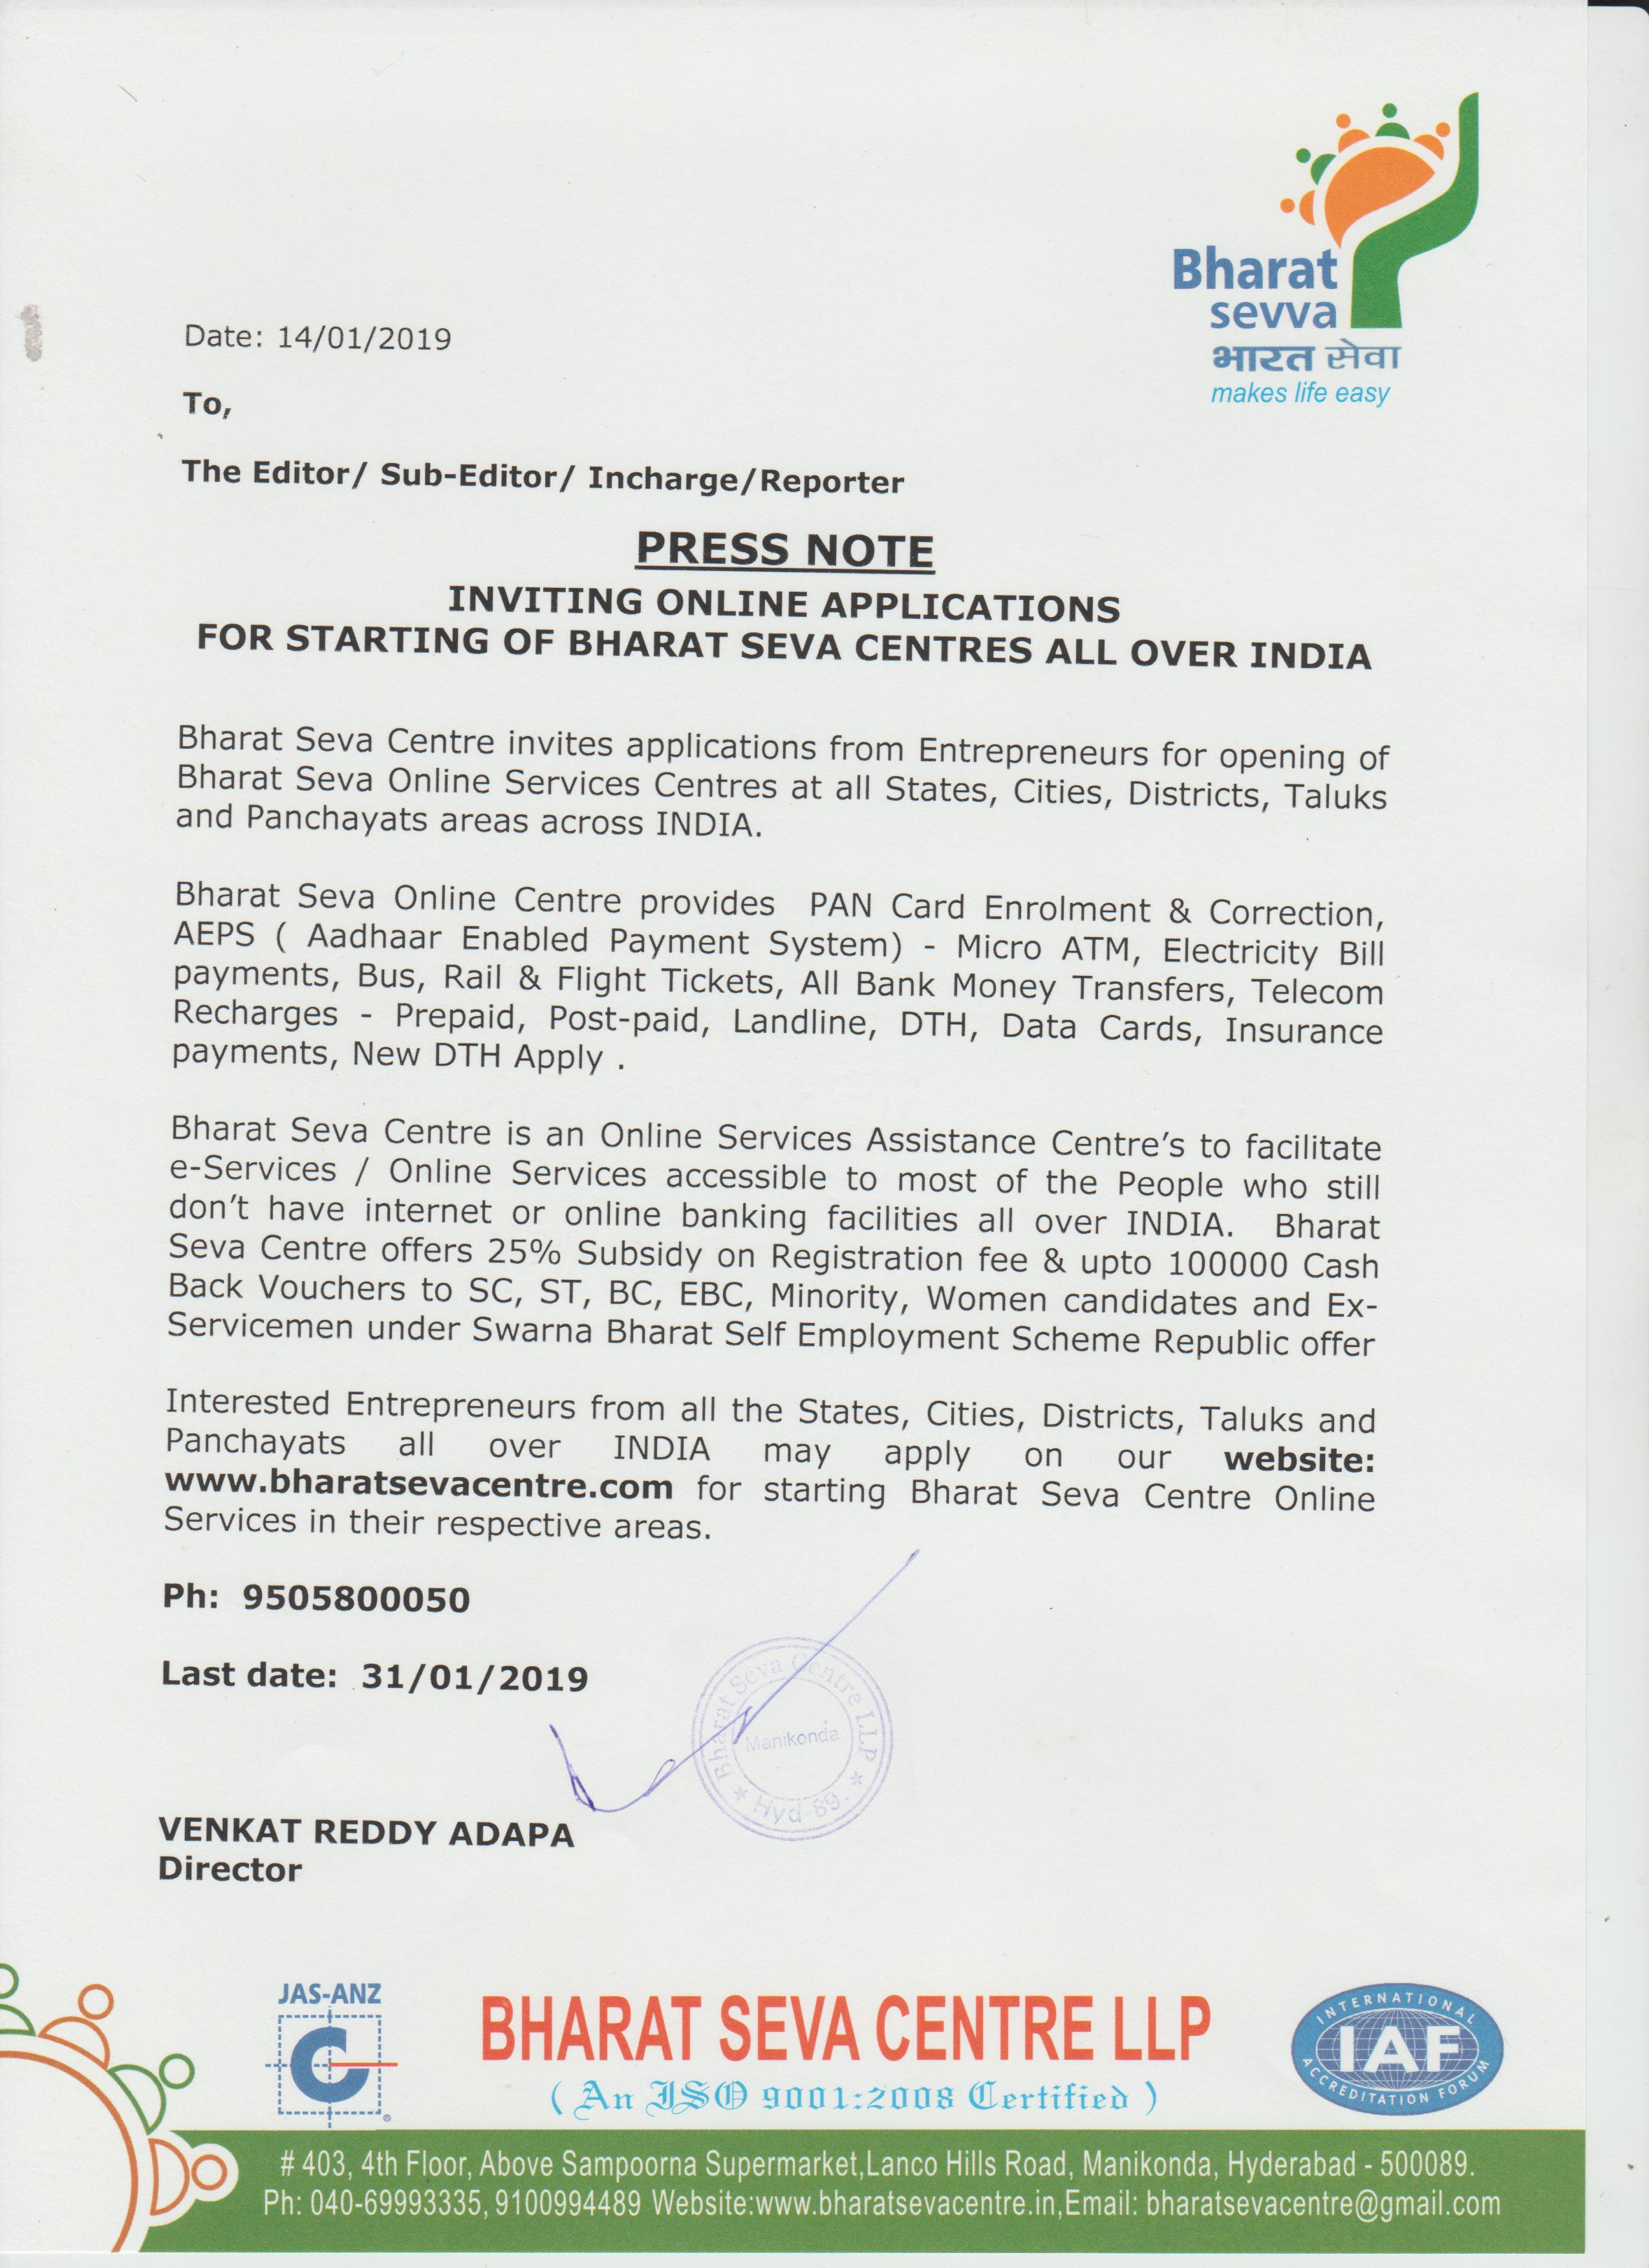 Inviting Online Applications for Starting of Bharat Seva Centres All